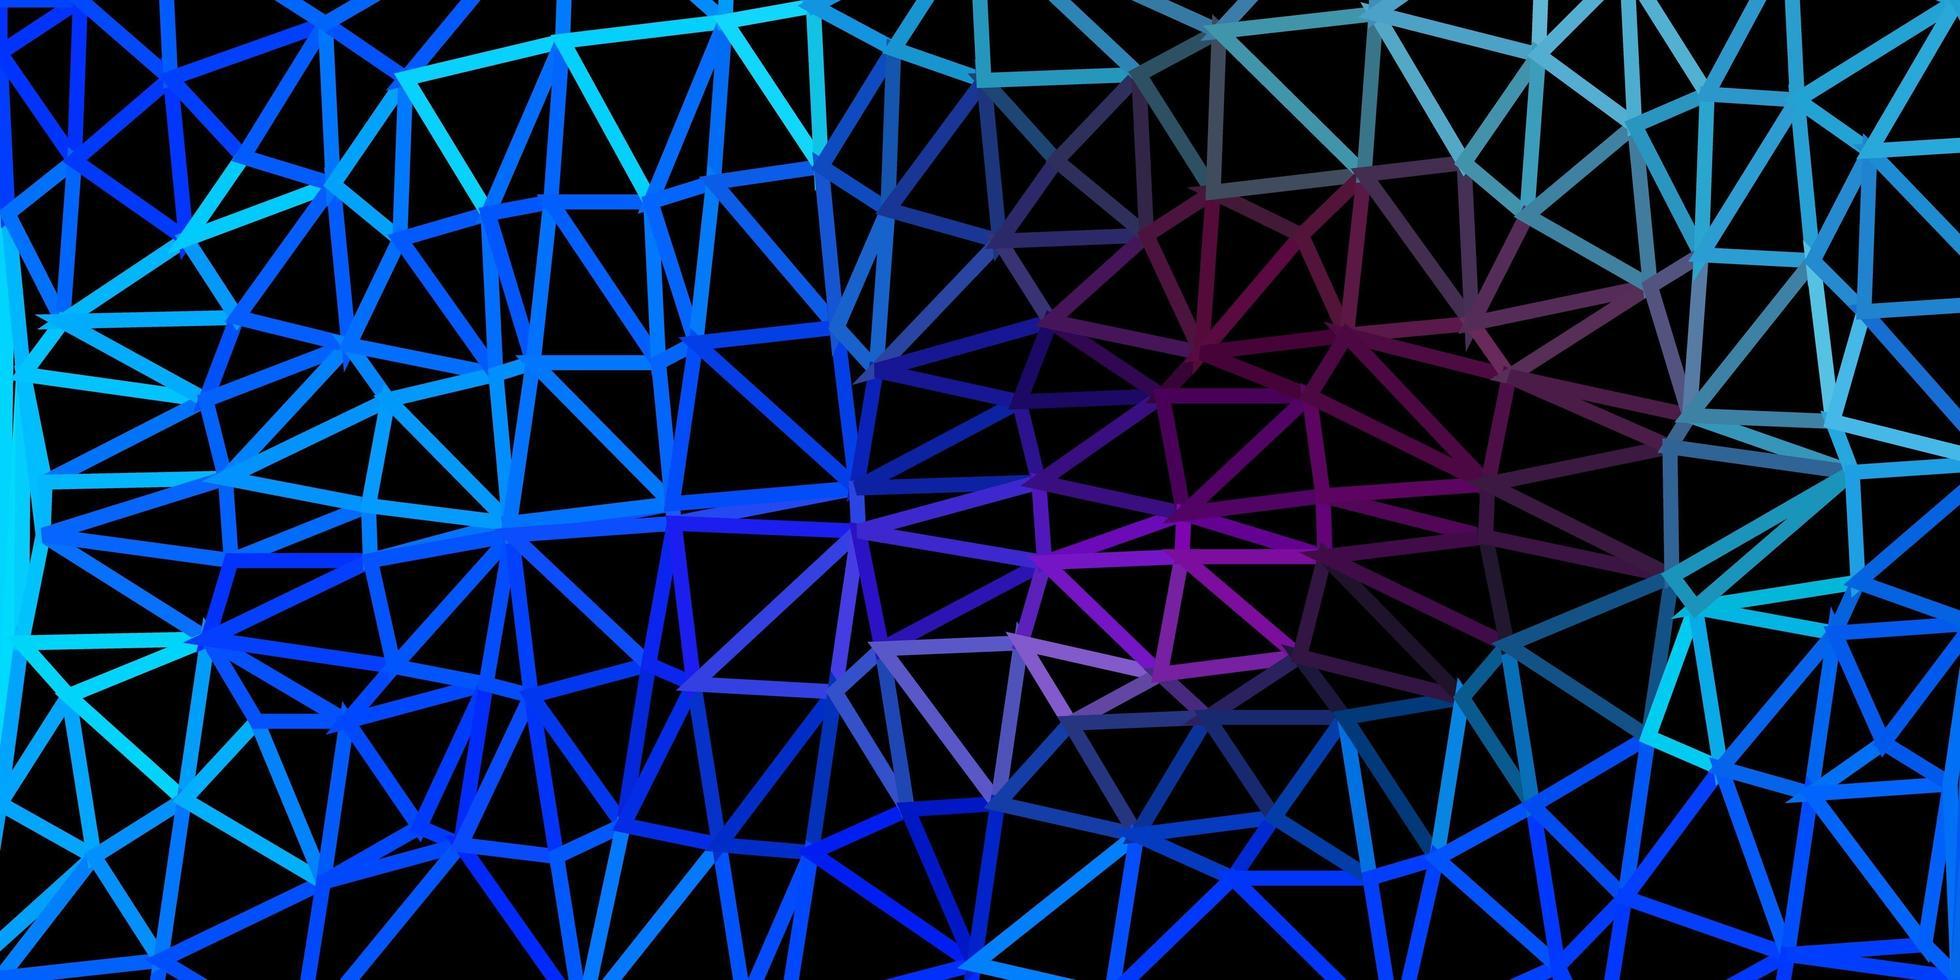 dunkelrosa, blauer Vektordreieckmosaikhintergrund. vektor